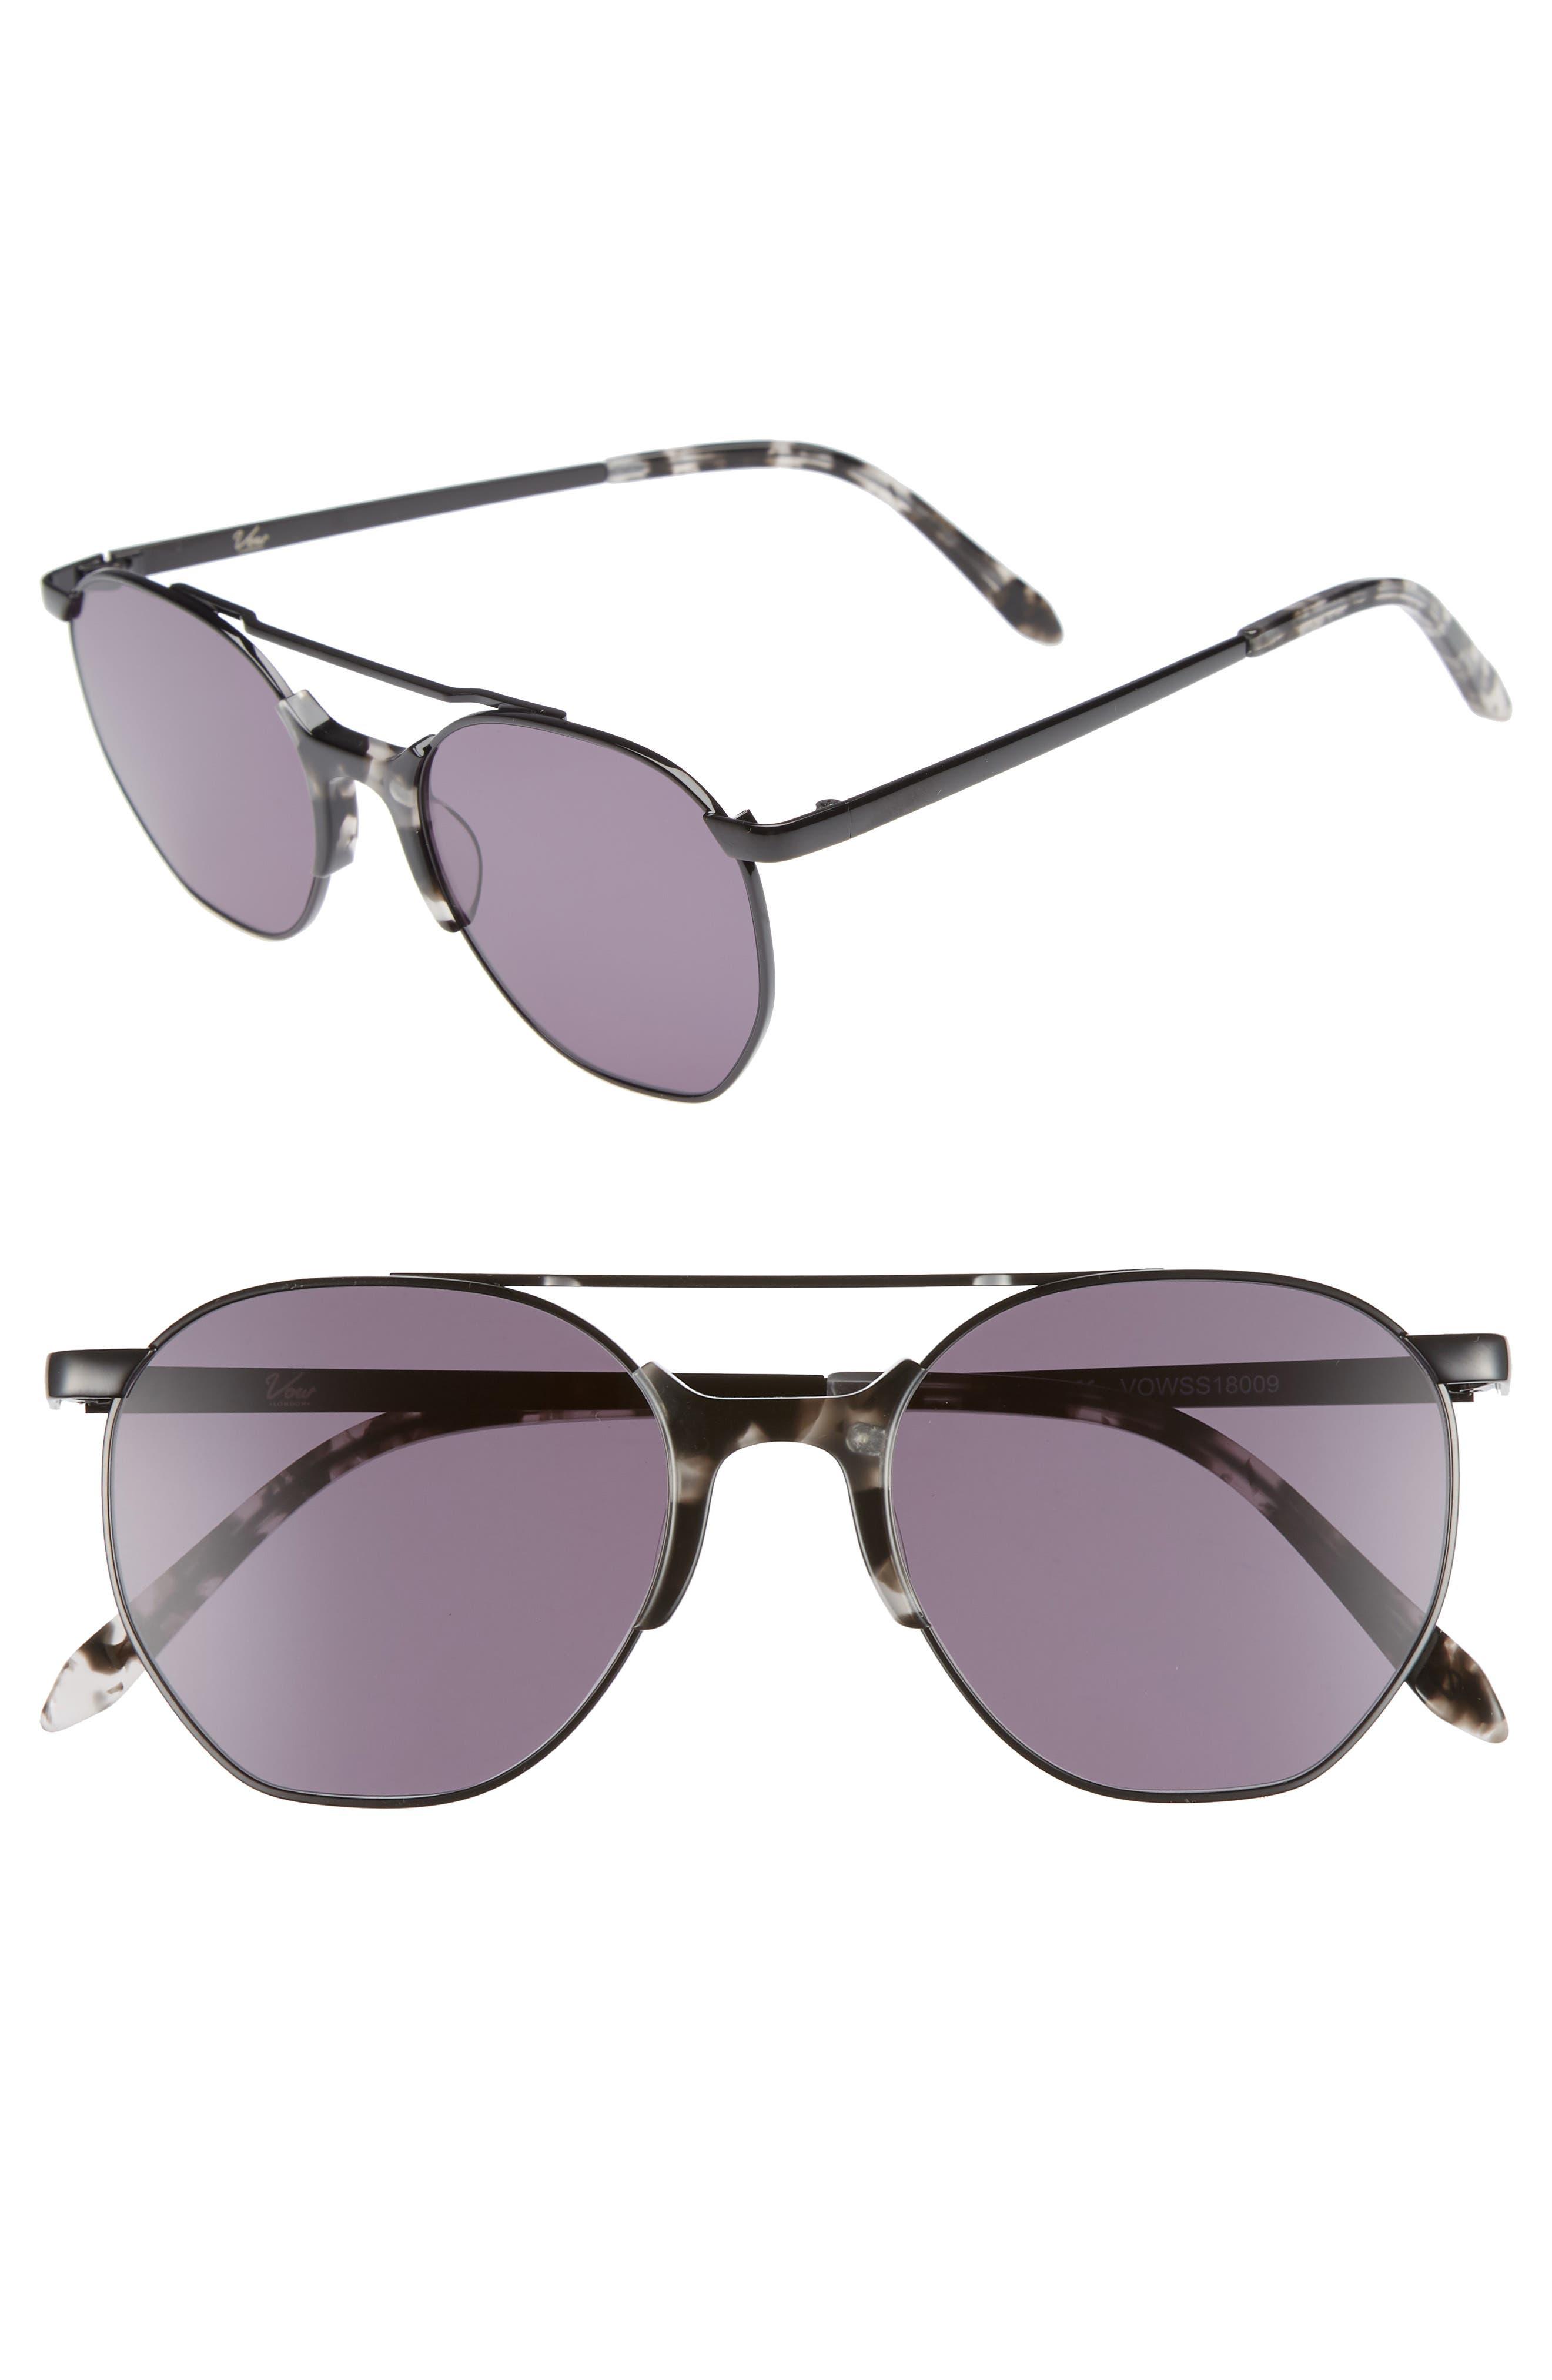 Raine 52mm Aviator Sunglasses,                             Main thumbnail 1, color,                             SMOKE TORTOISE/ BLACK